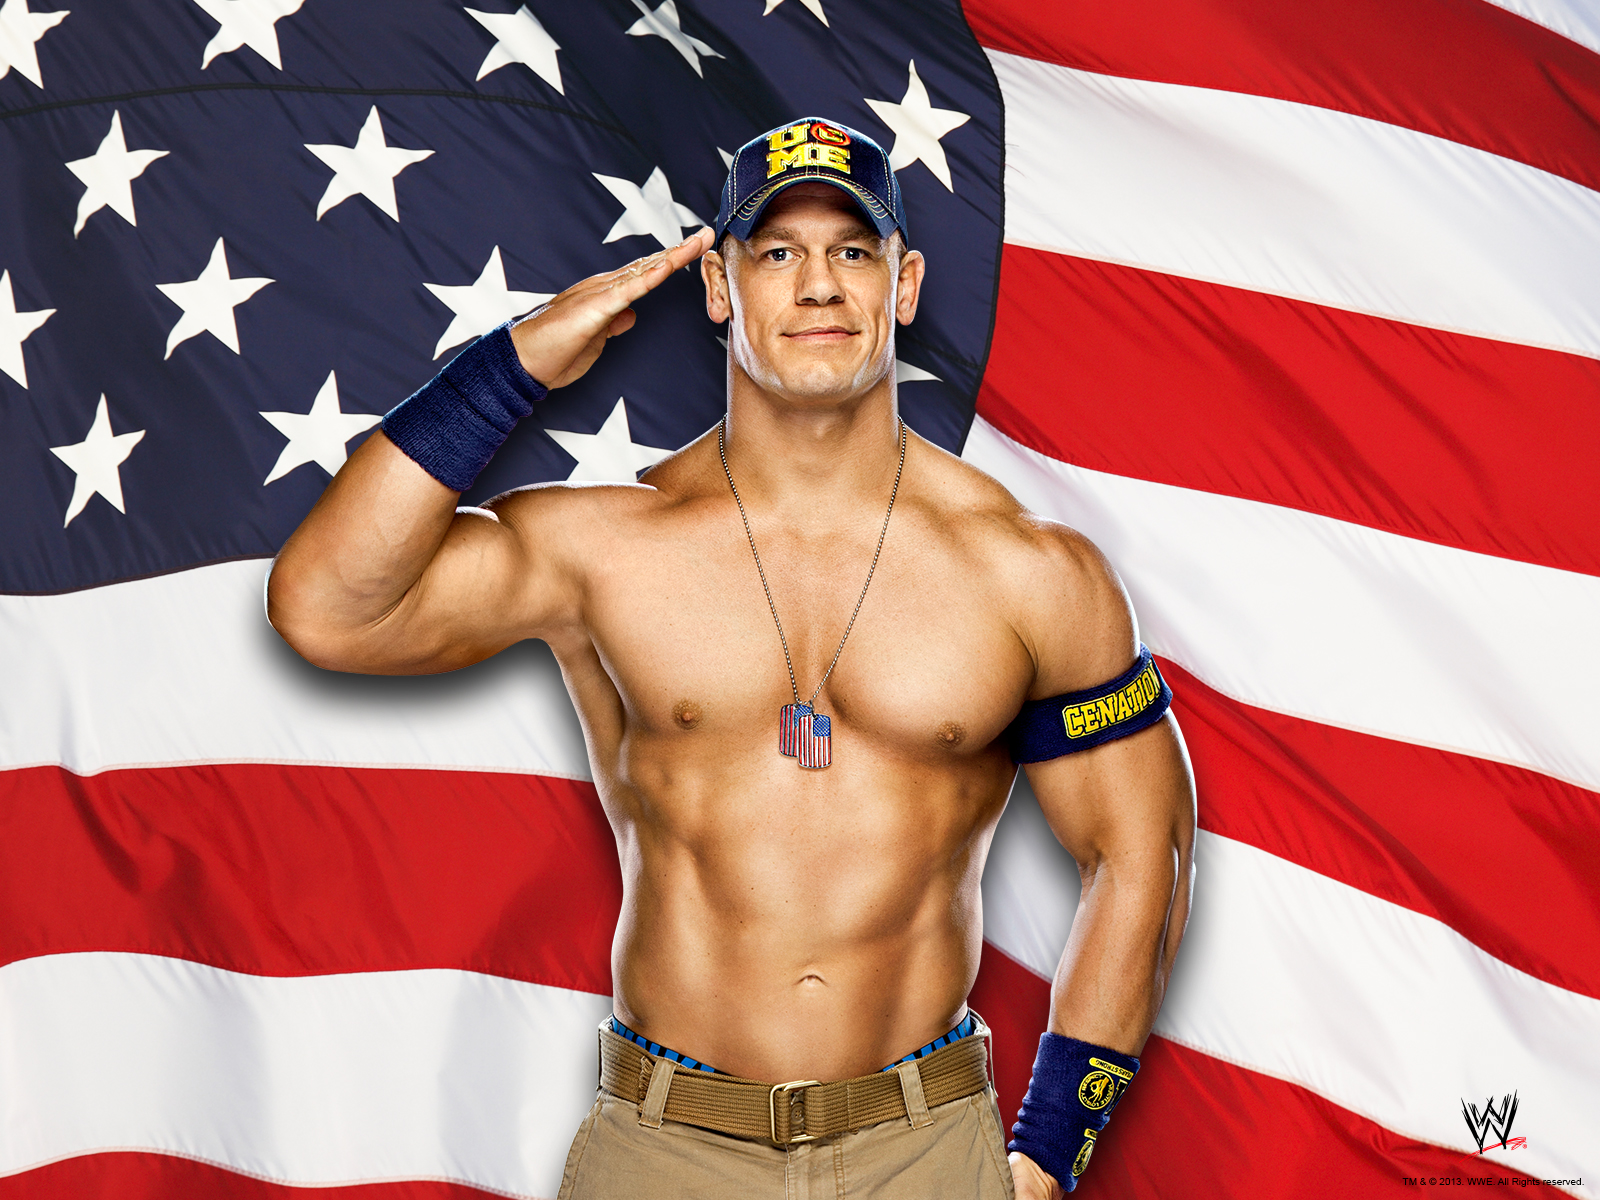 John Cena Wallpaper   WWE Wallpaper 36843521 1600x1200